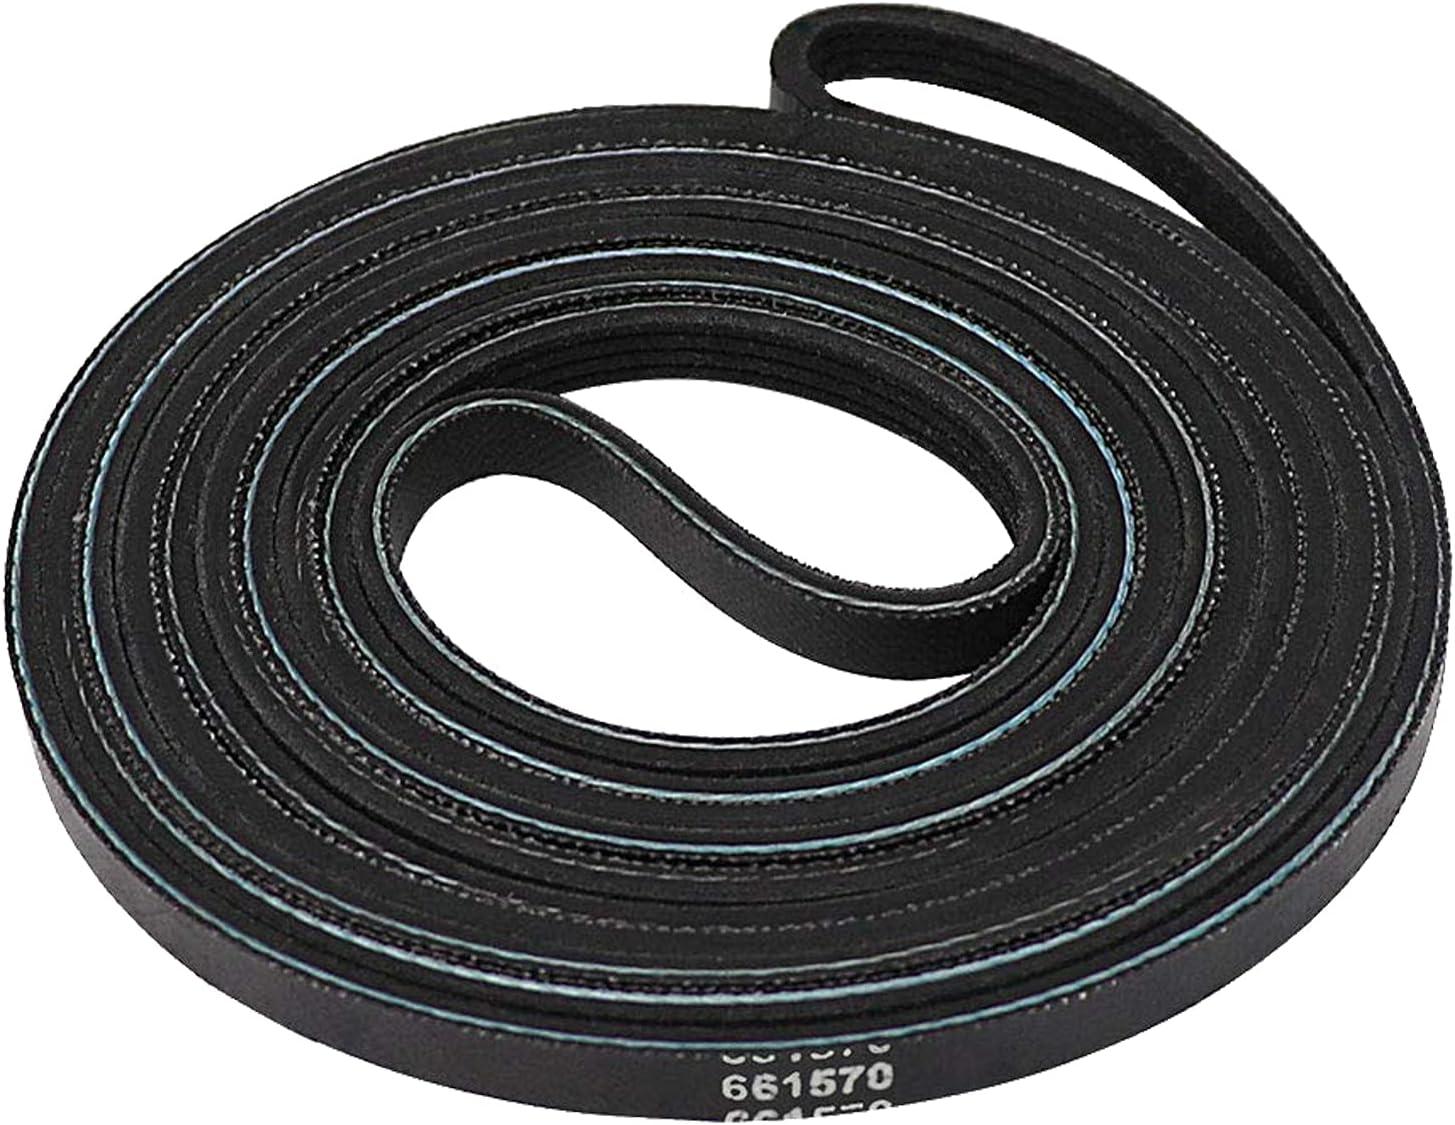 Whirlpool Dryer Drum Belt 661570